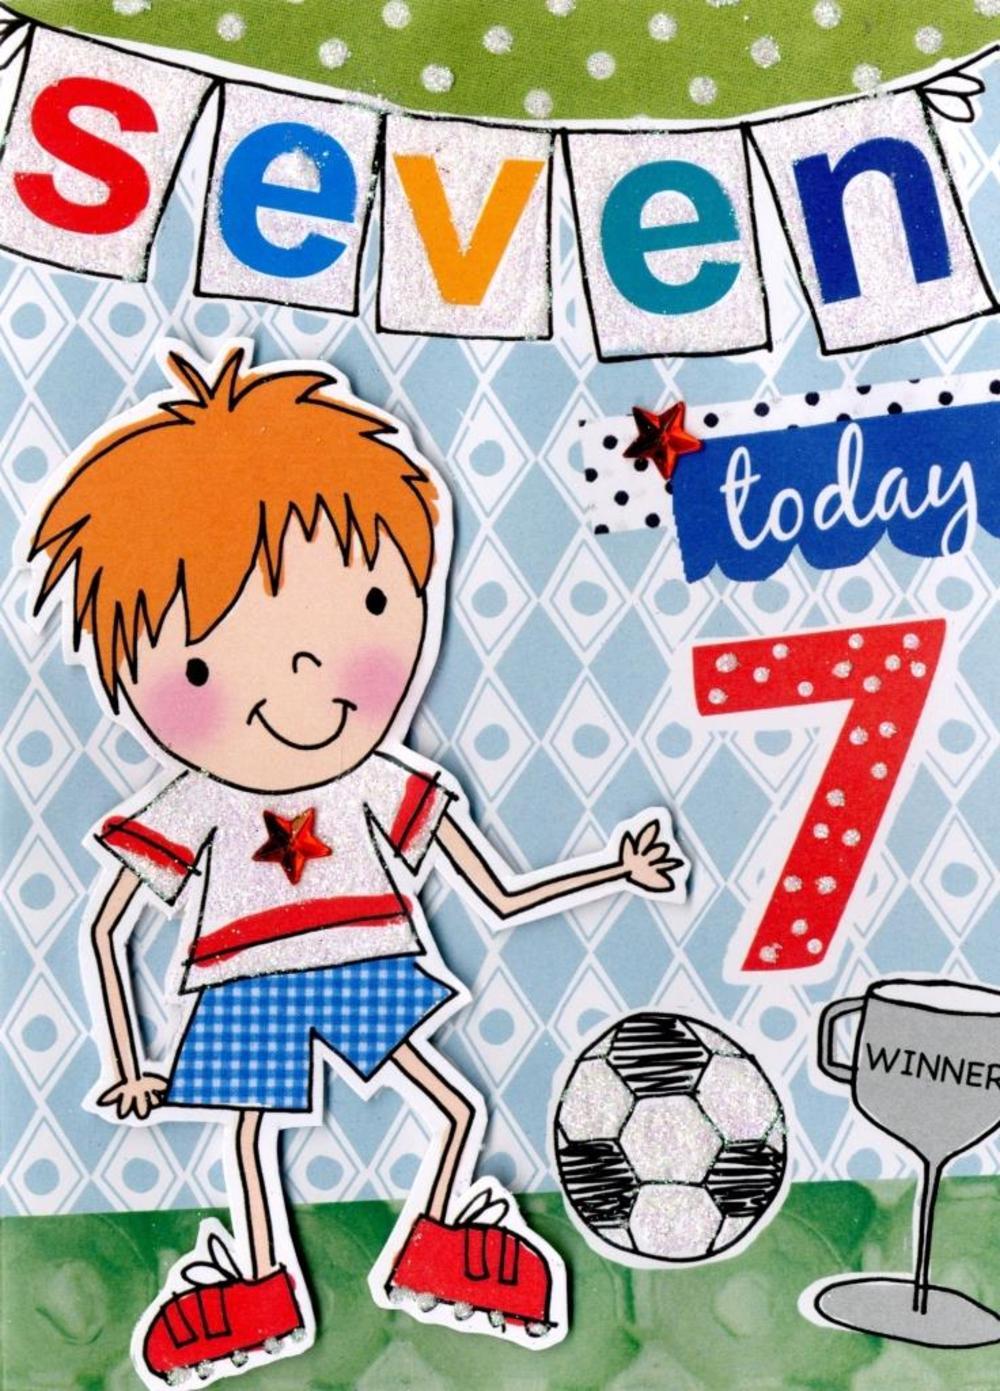 Boys 7th Birthday Card Seven Today Cards – Birthday Cards for Boys